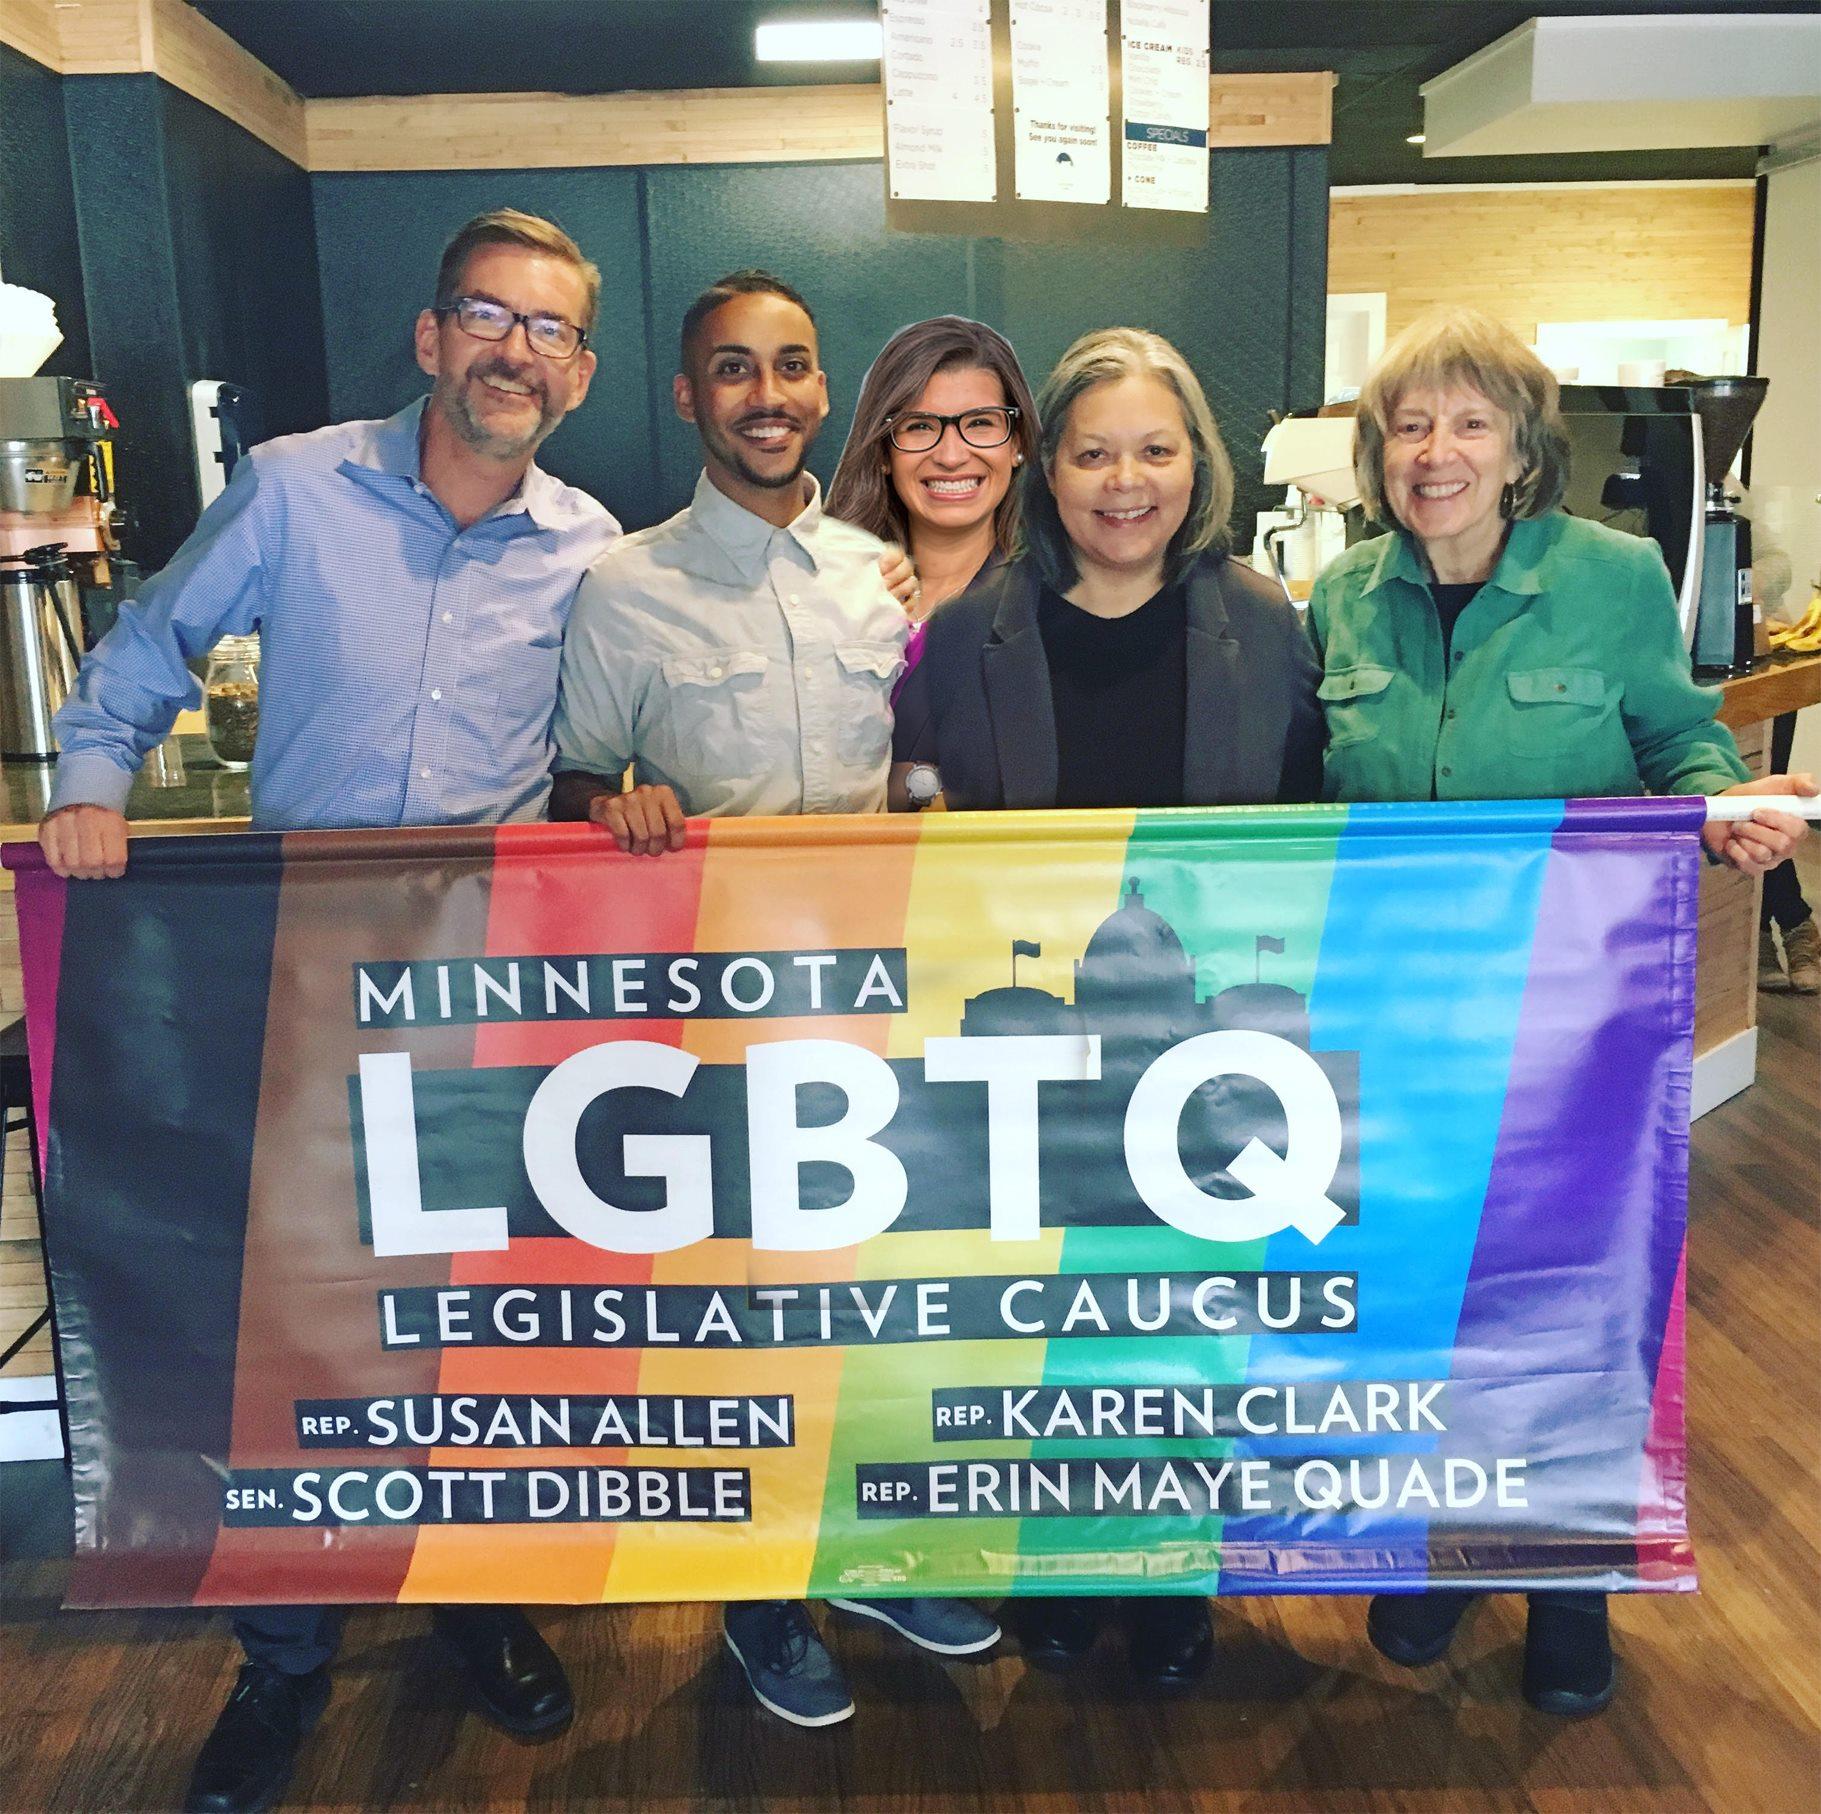 minnesota lgbtq caucus endorsement photo